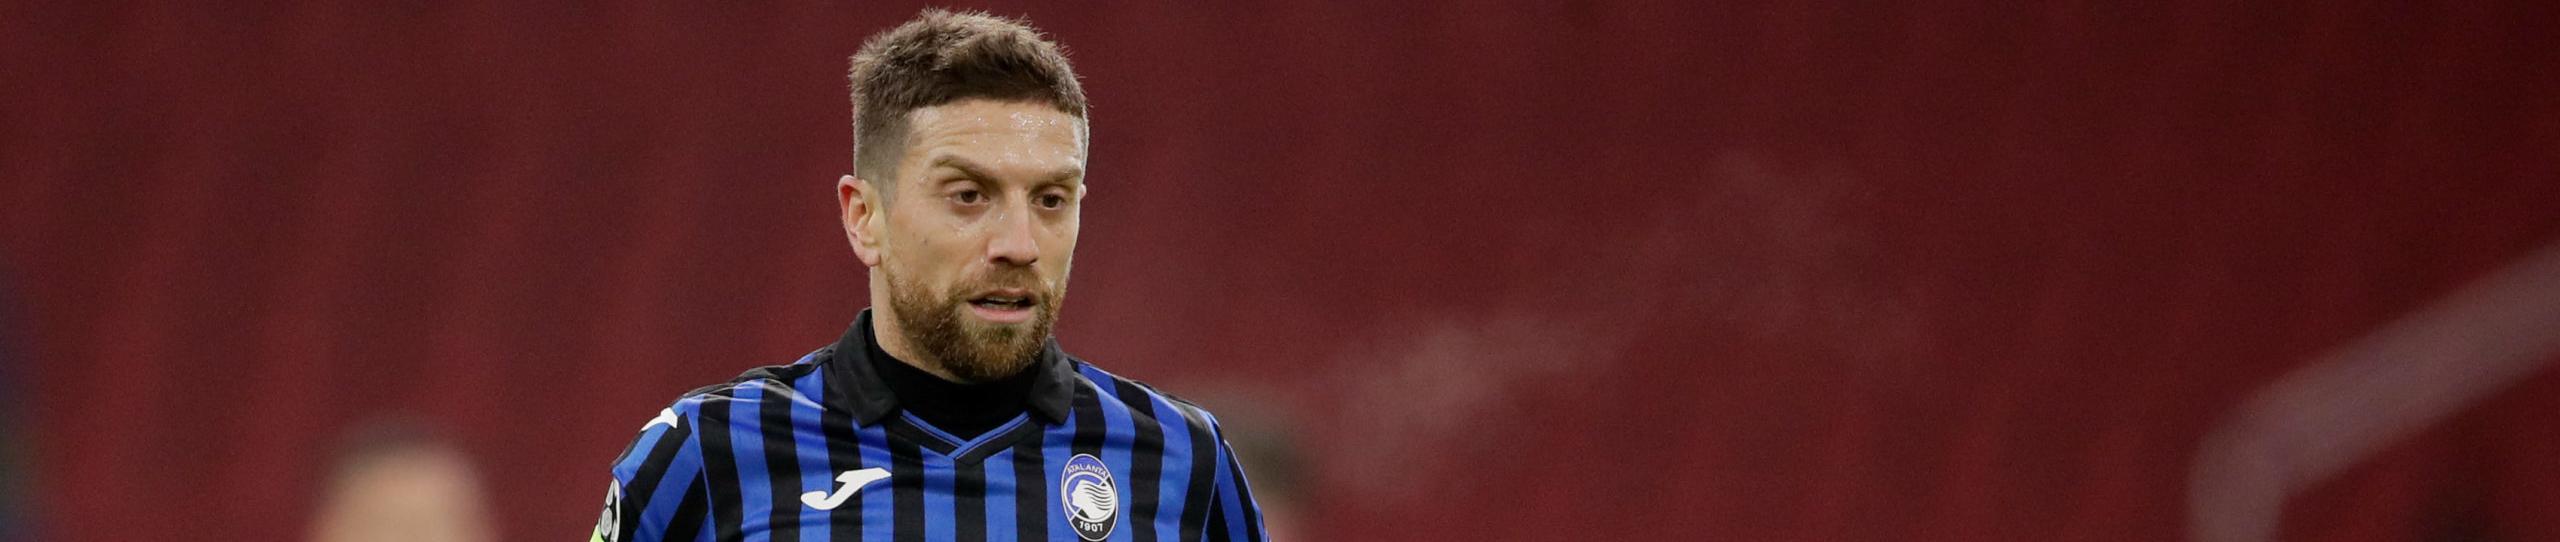 Pronostico Juventus-Atalanta, Gomez ancora in panchina - le ultimissime